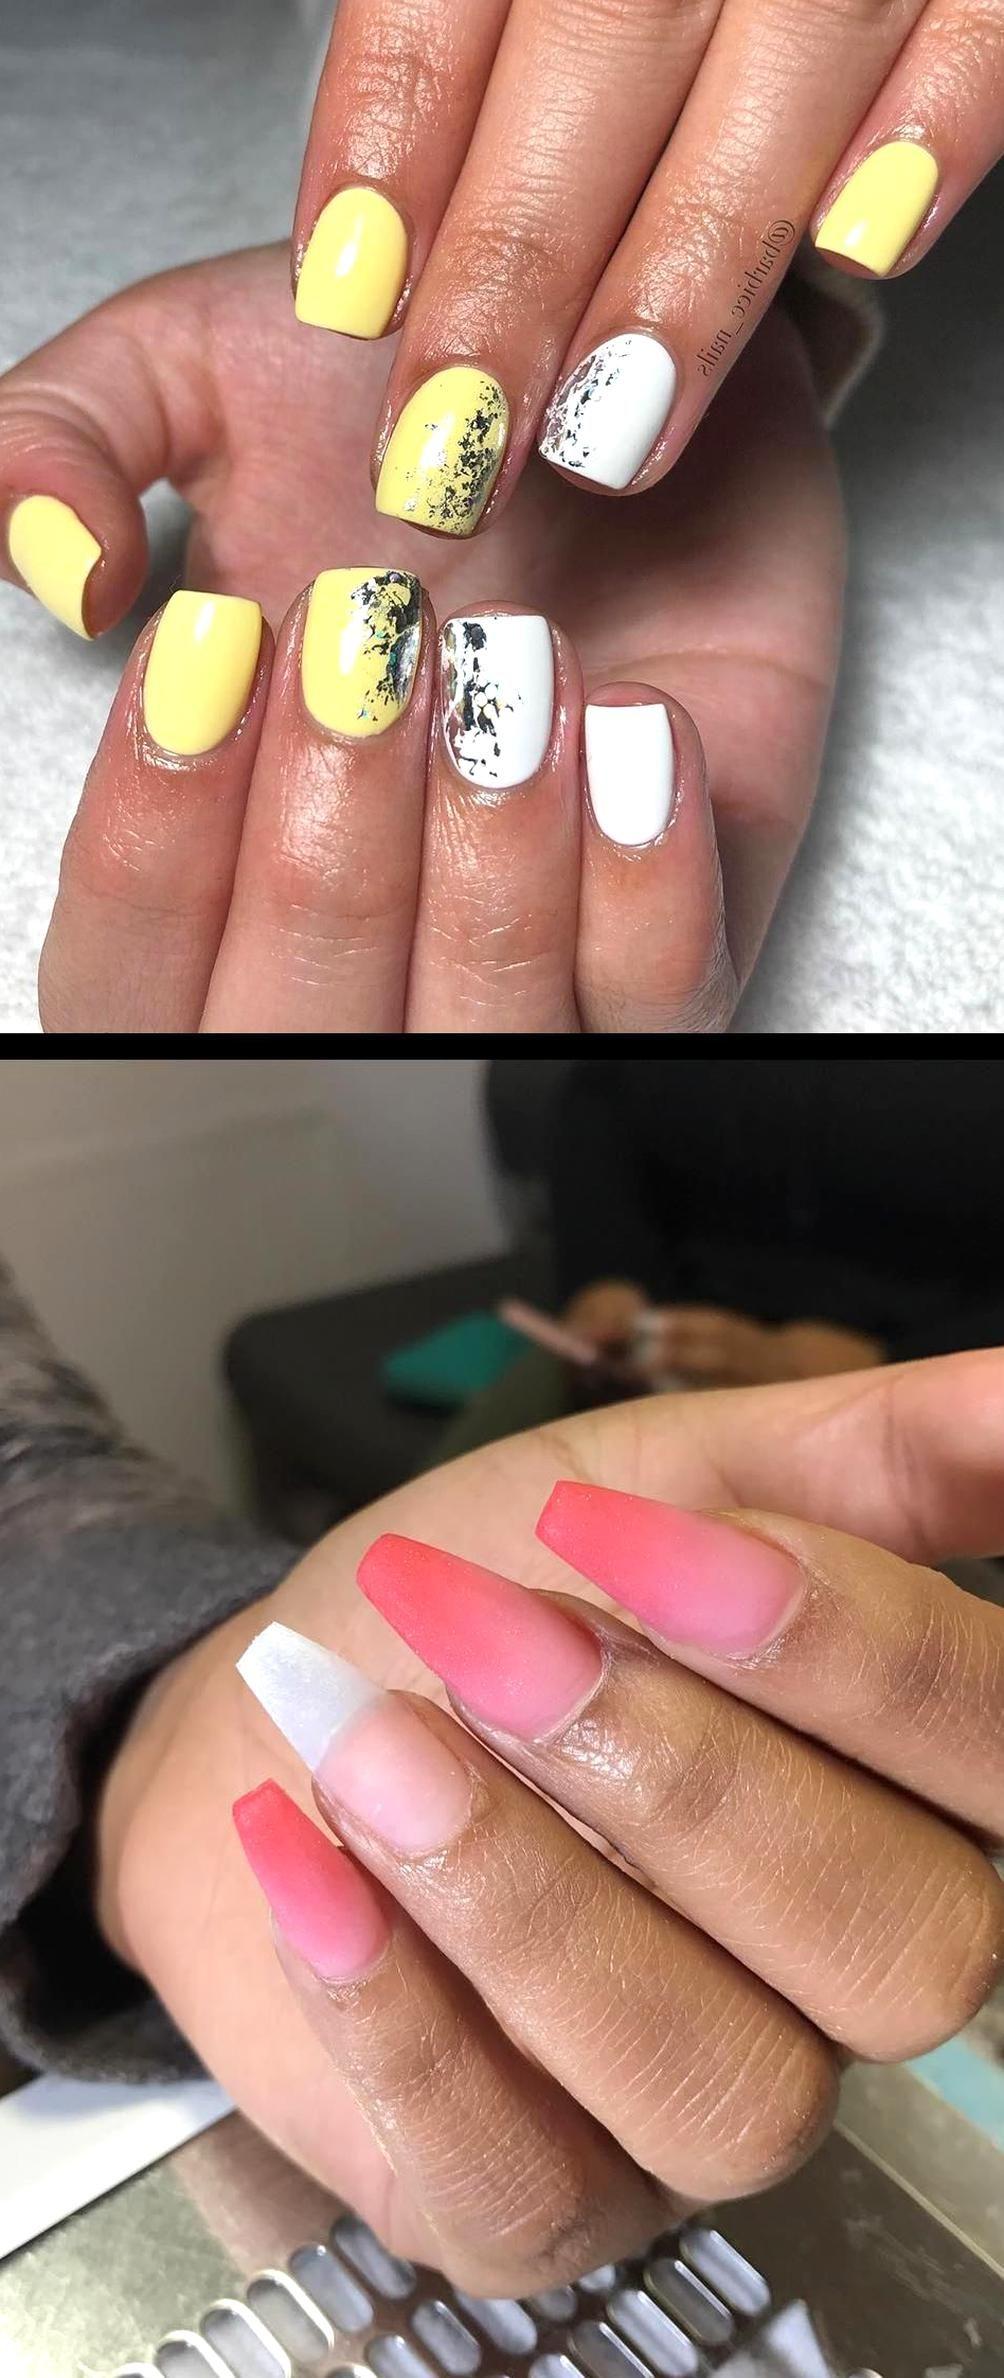 Turquoise Nails White Acrylic Nails Papel Foilestoy Cansada Pero A La Vez Muy Plena Y Feliz Por Trabajar En In 2020 Jasmine Nails Turquoise Nails White Acrylic Nails